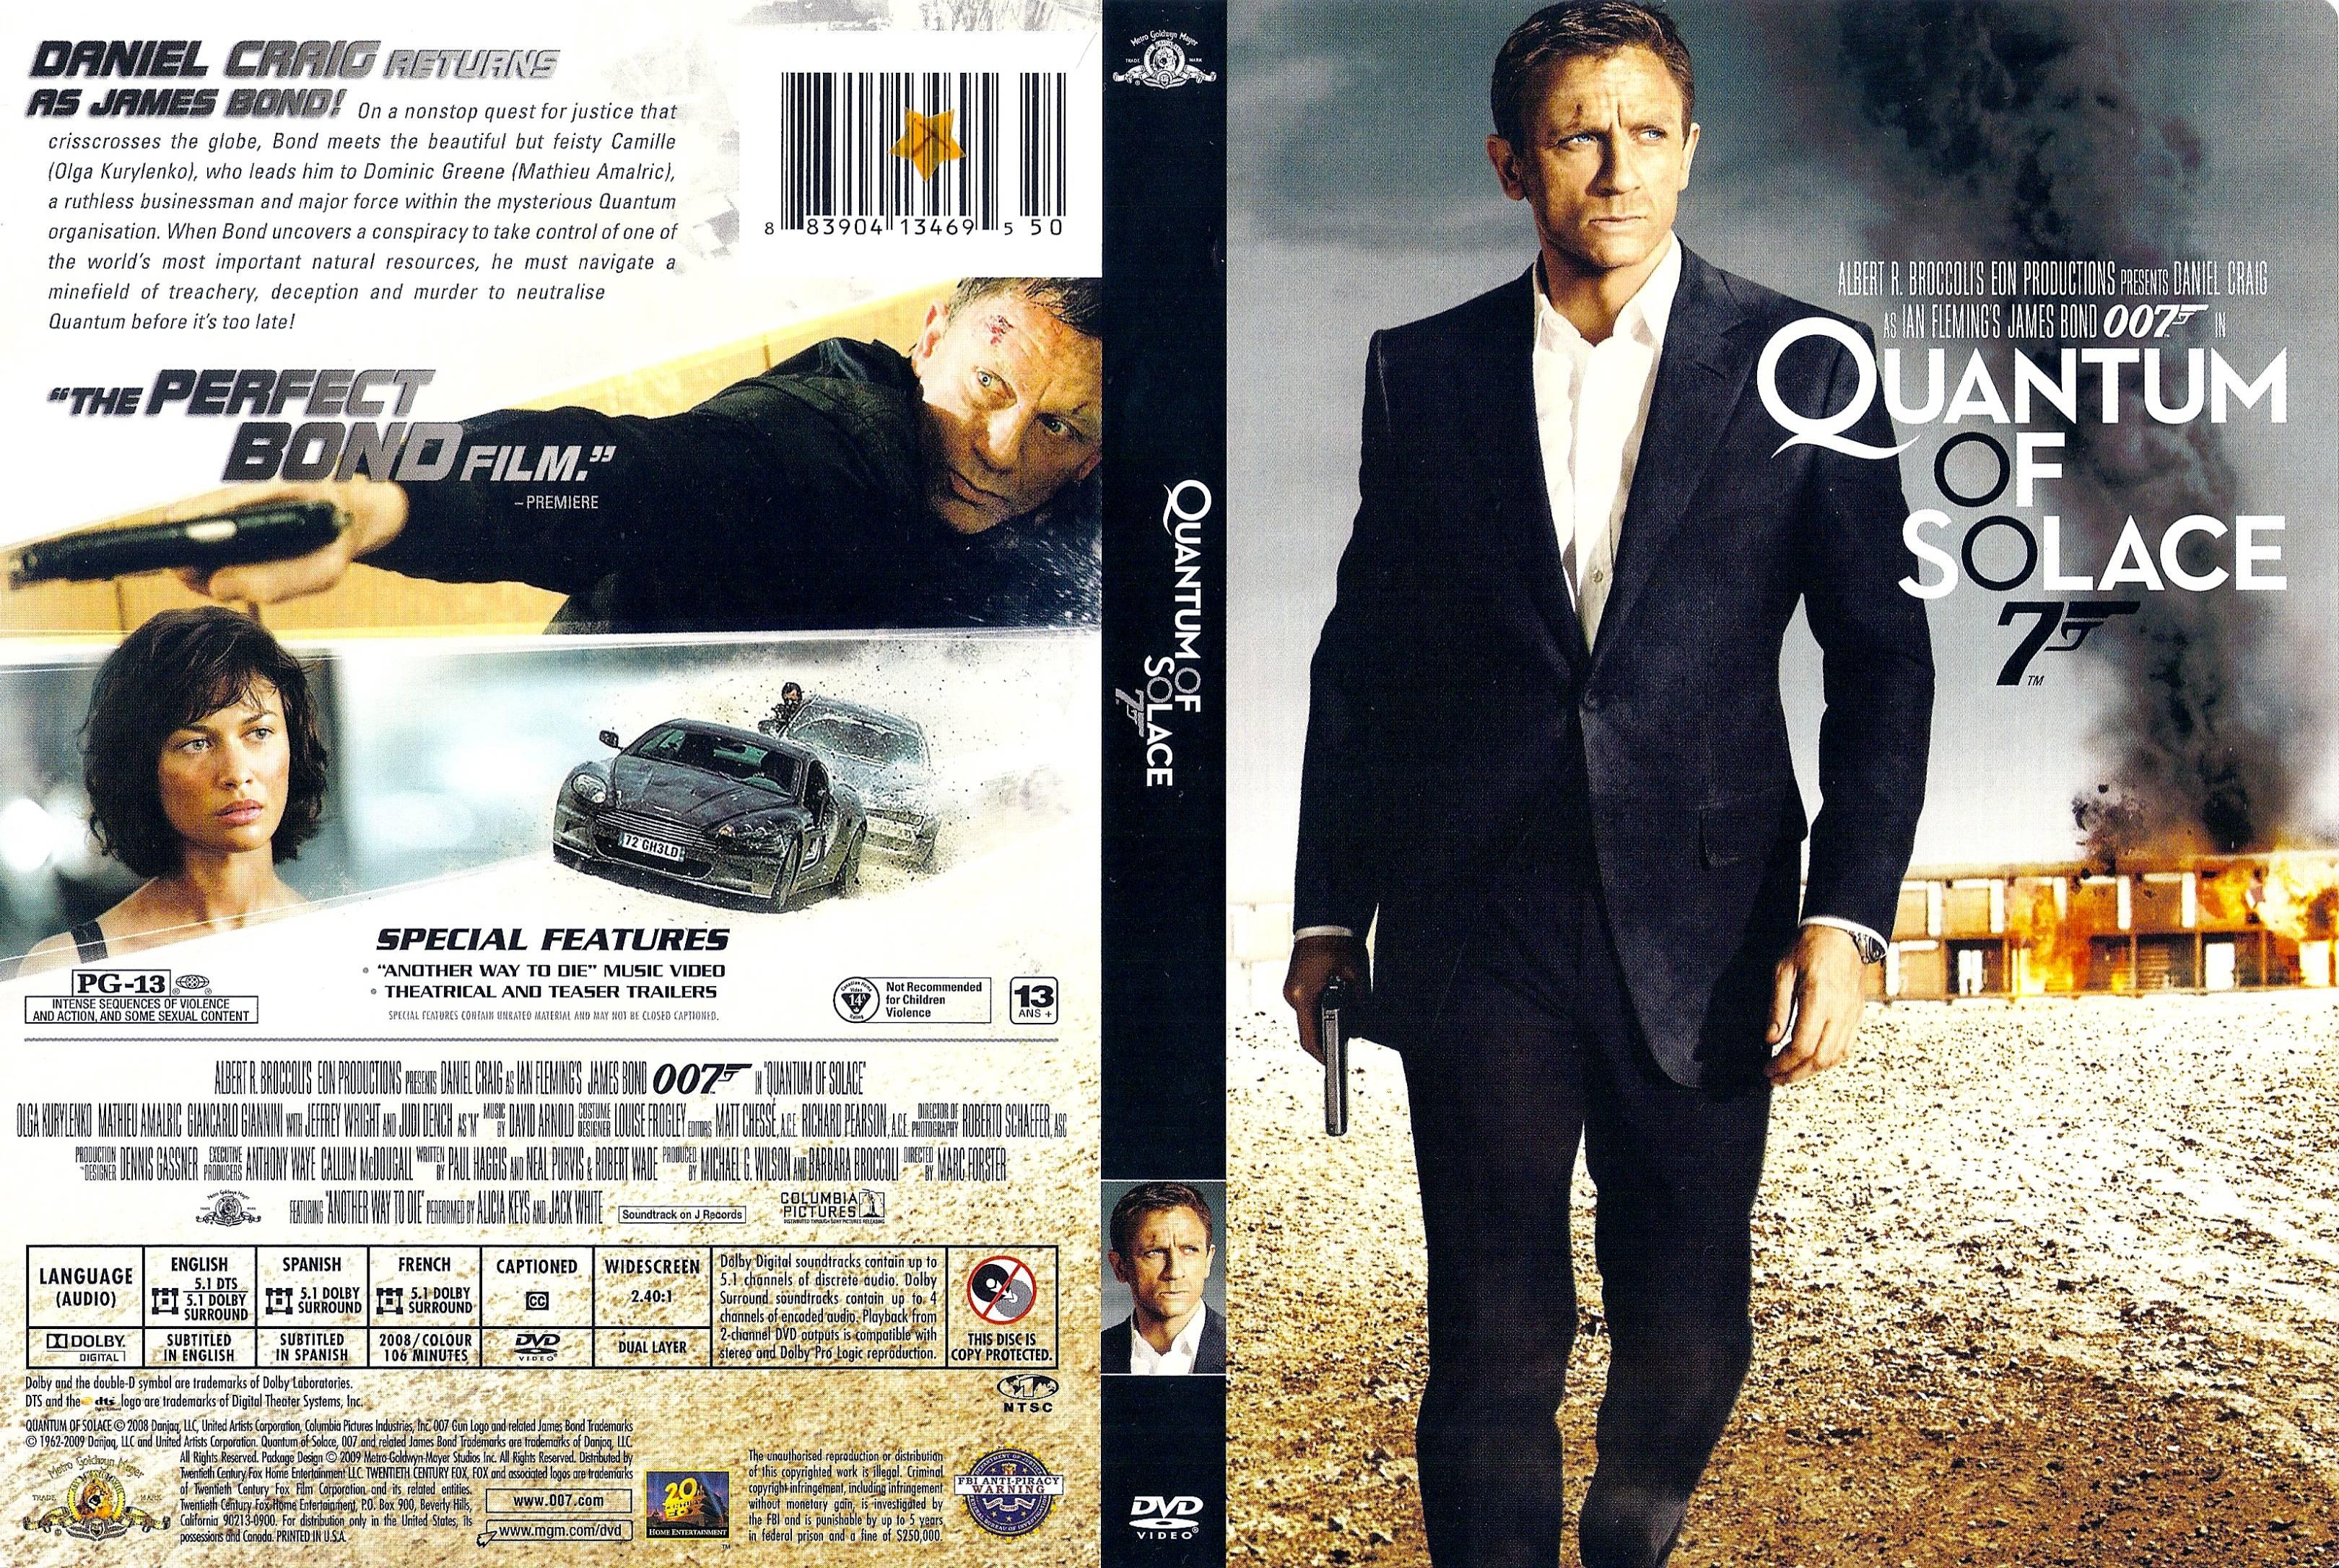 Videon0e1vody,n0e1vody, savegame,recenze,ulo17een0e9 pozice, walkthrough, james bond 007 -quantum of solace- the game